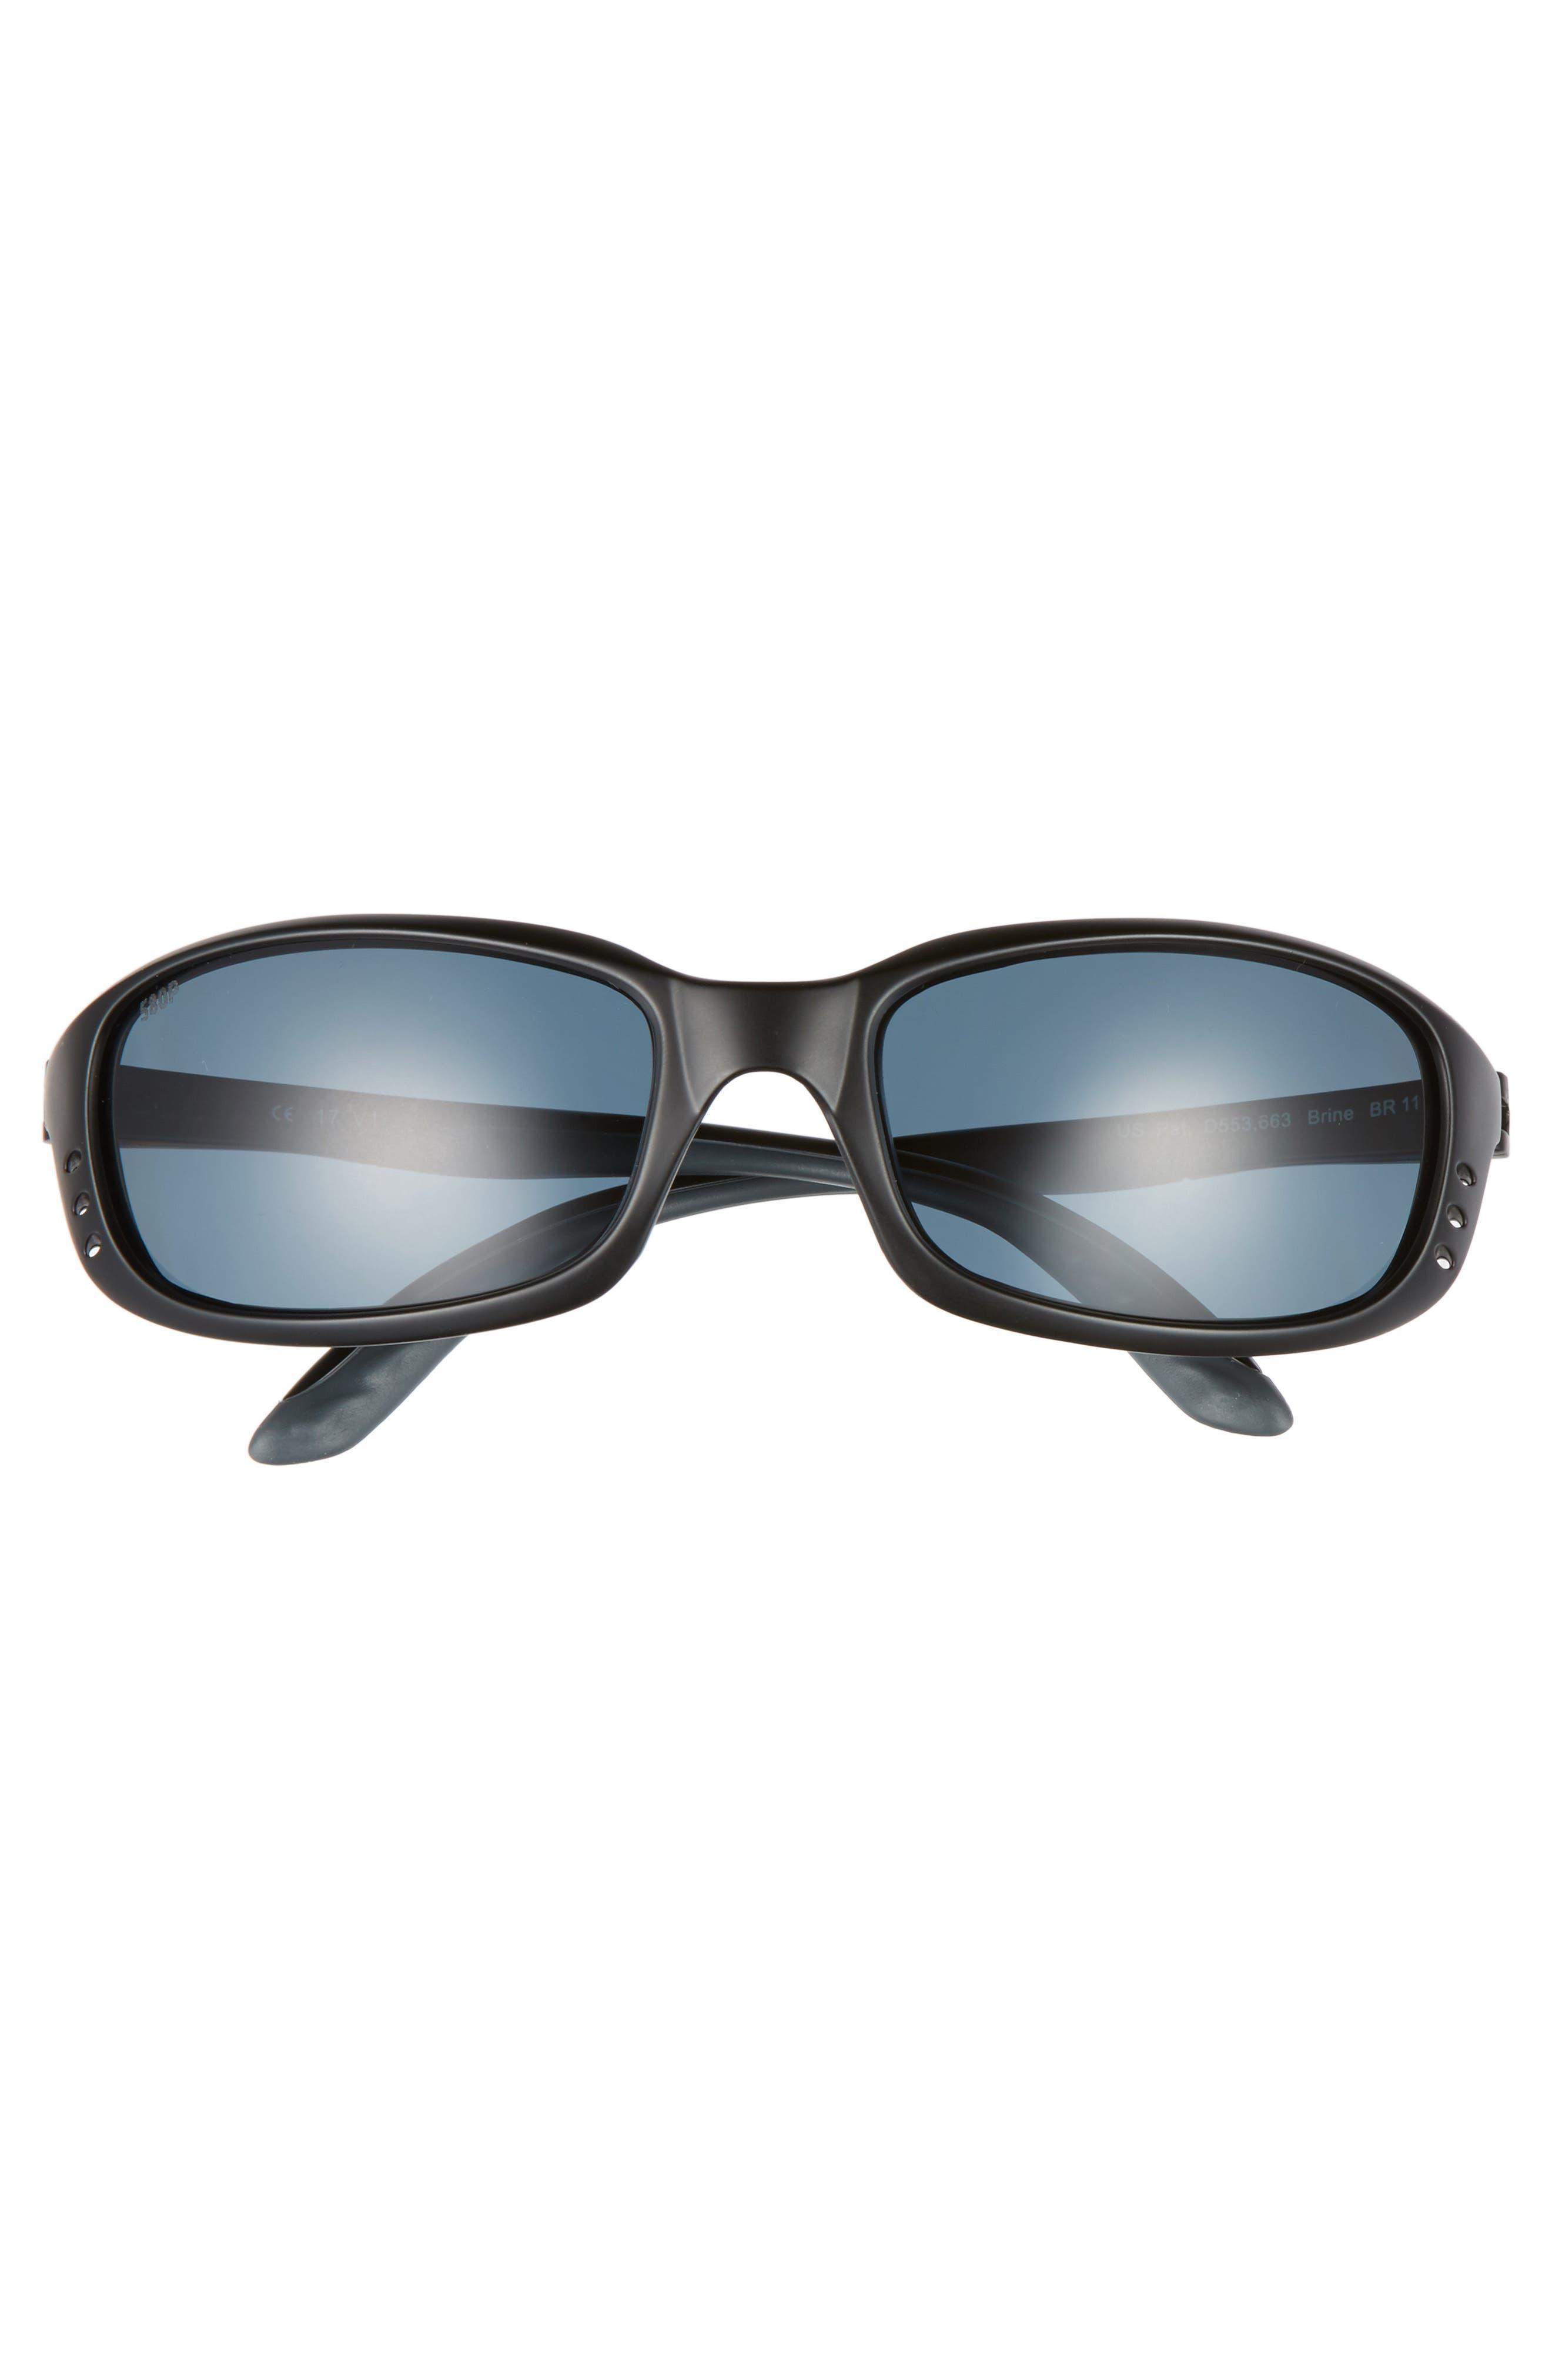 Brine Polarized 60mm Sunglasses,                             Alternate thumbnail 2, color,                             MATTE BLACK/ GREY